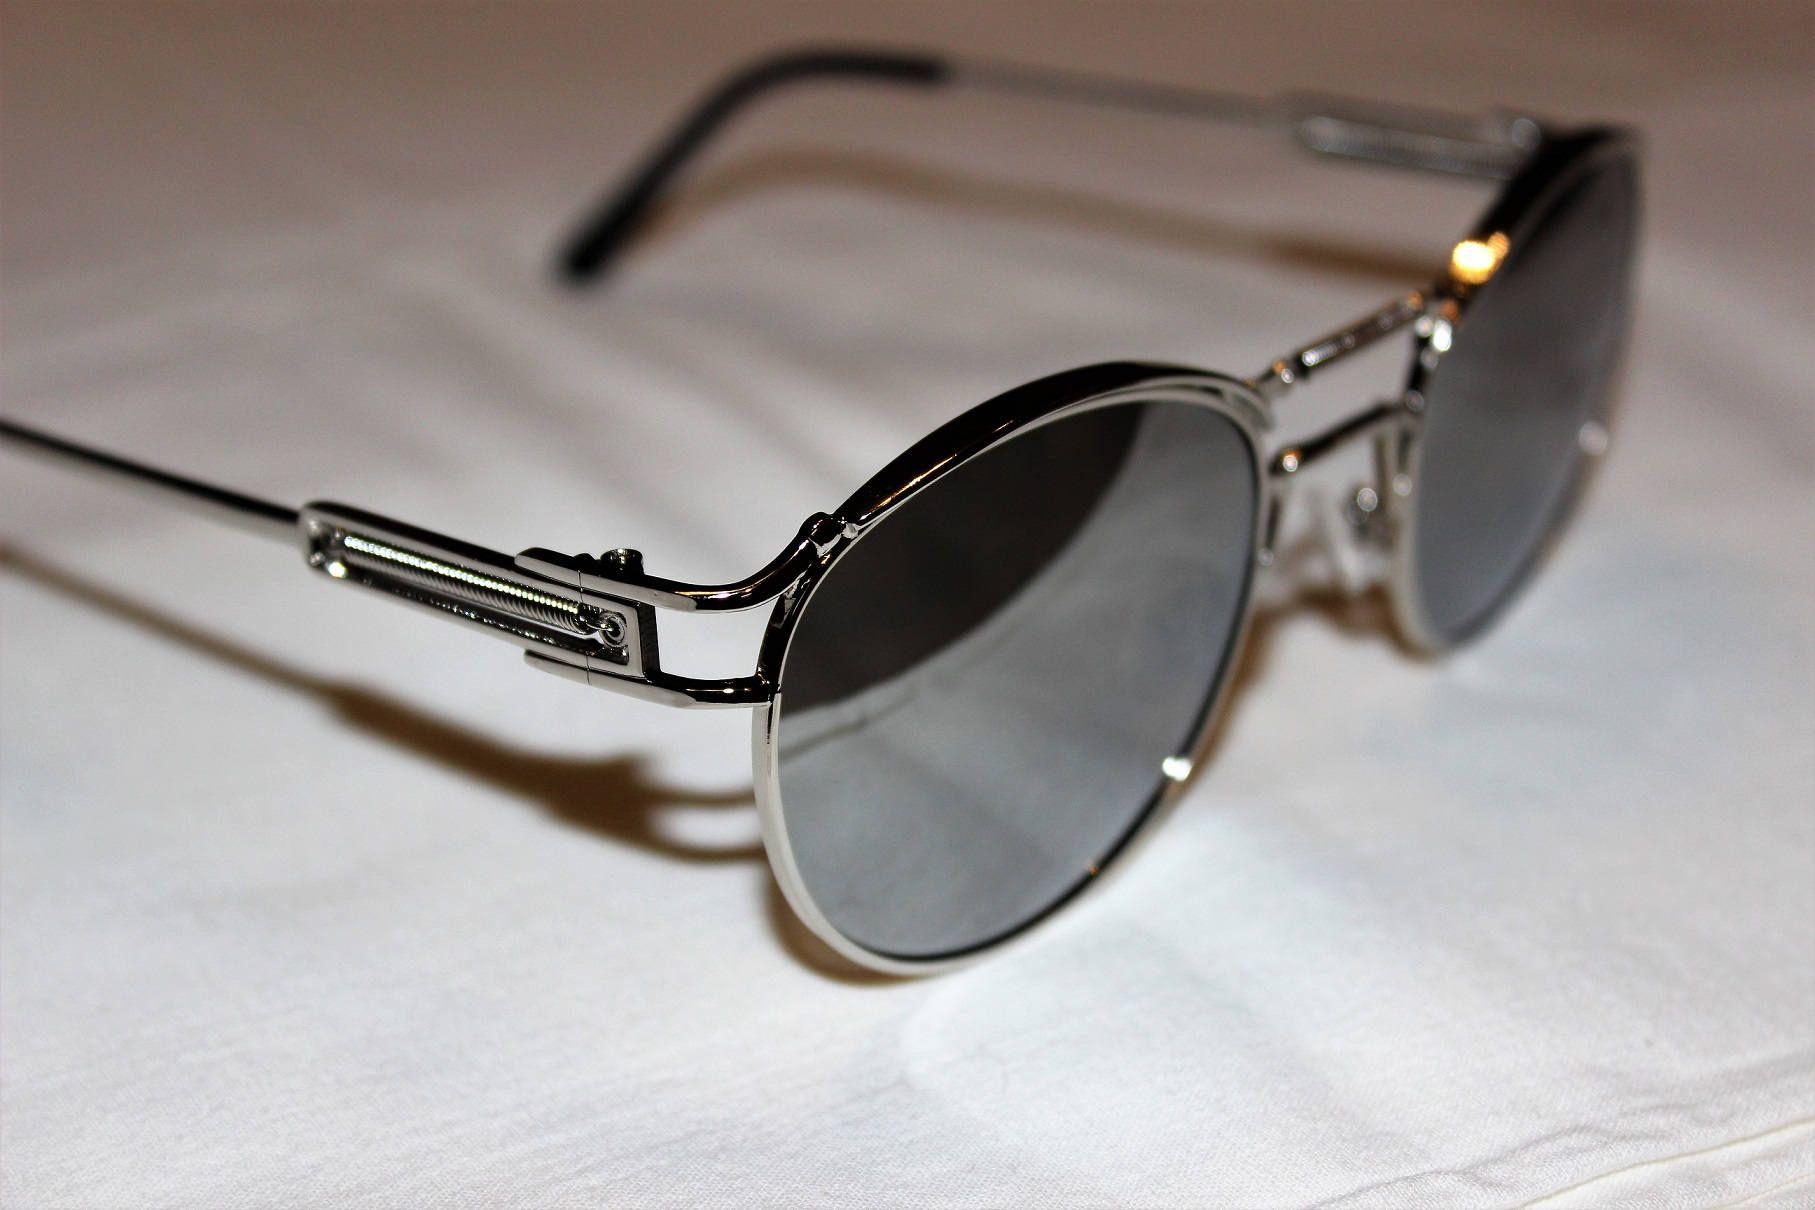 RAY-BAN RB4323 Square Wayfarer Sunglasses Transparent Grey